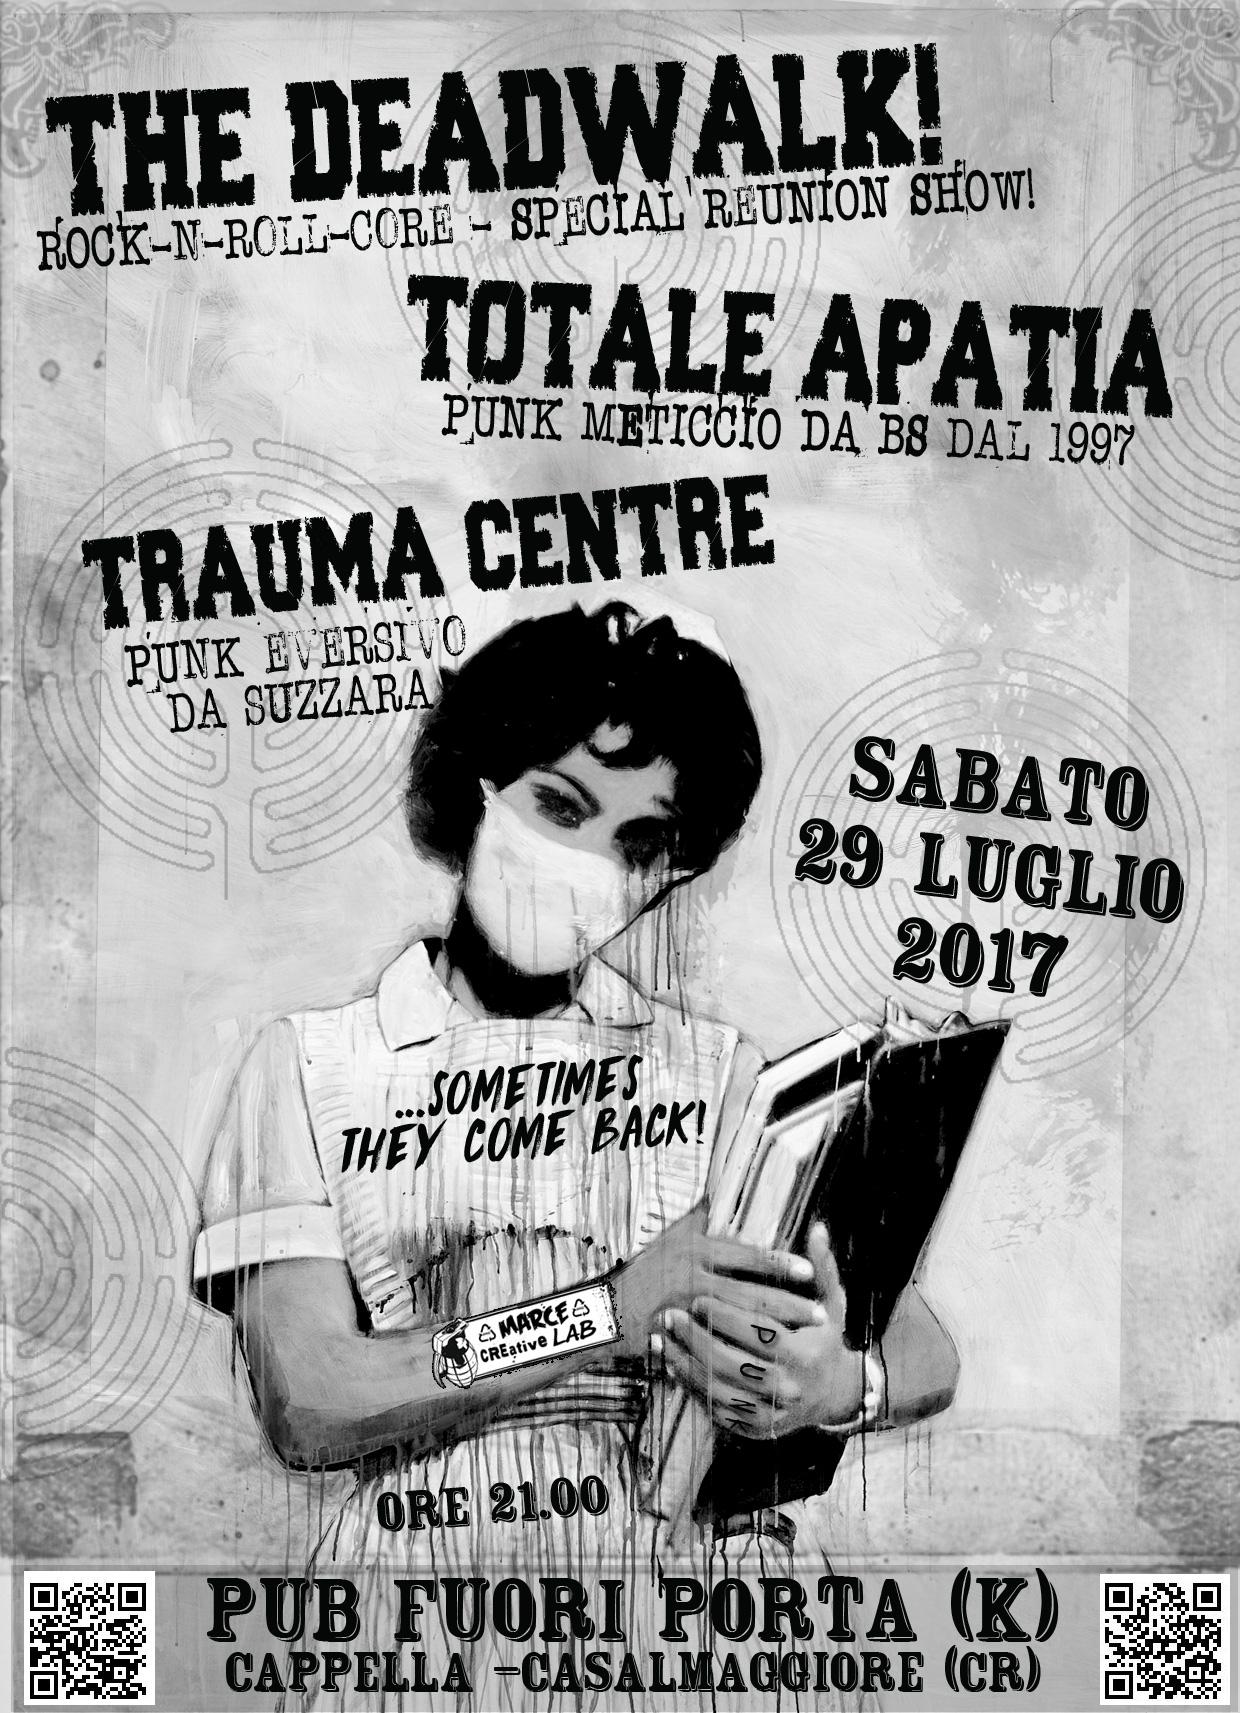 The Deadwalk! reunion show + Totale Apatia + Trauma Centre